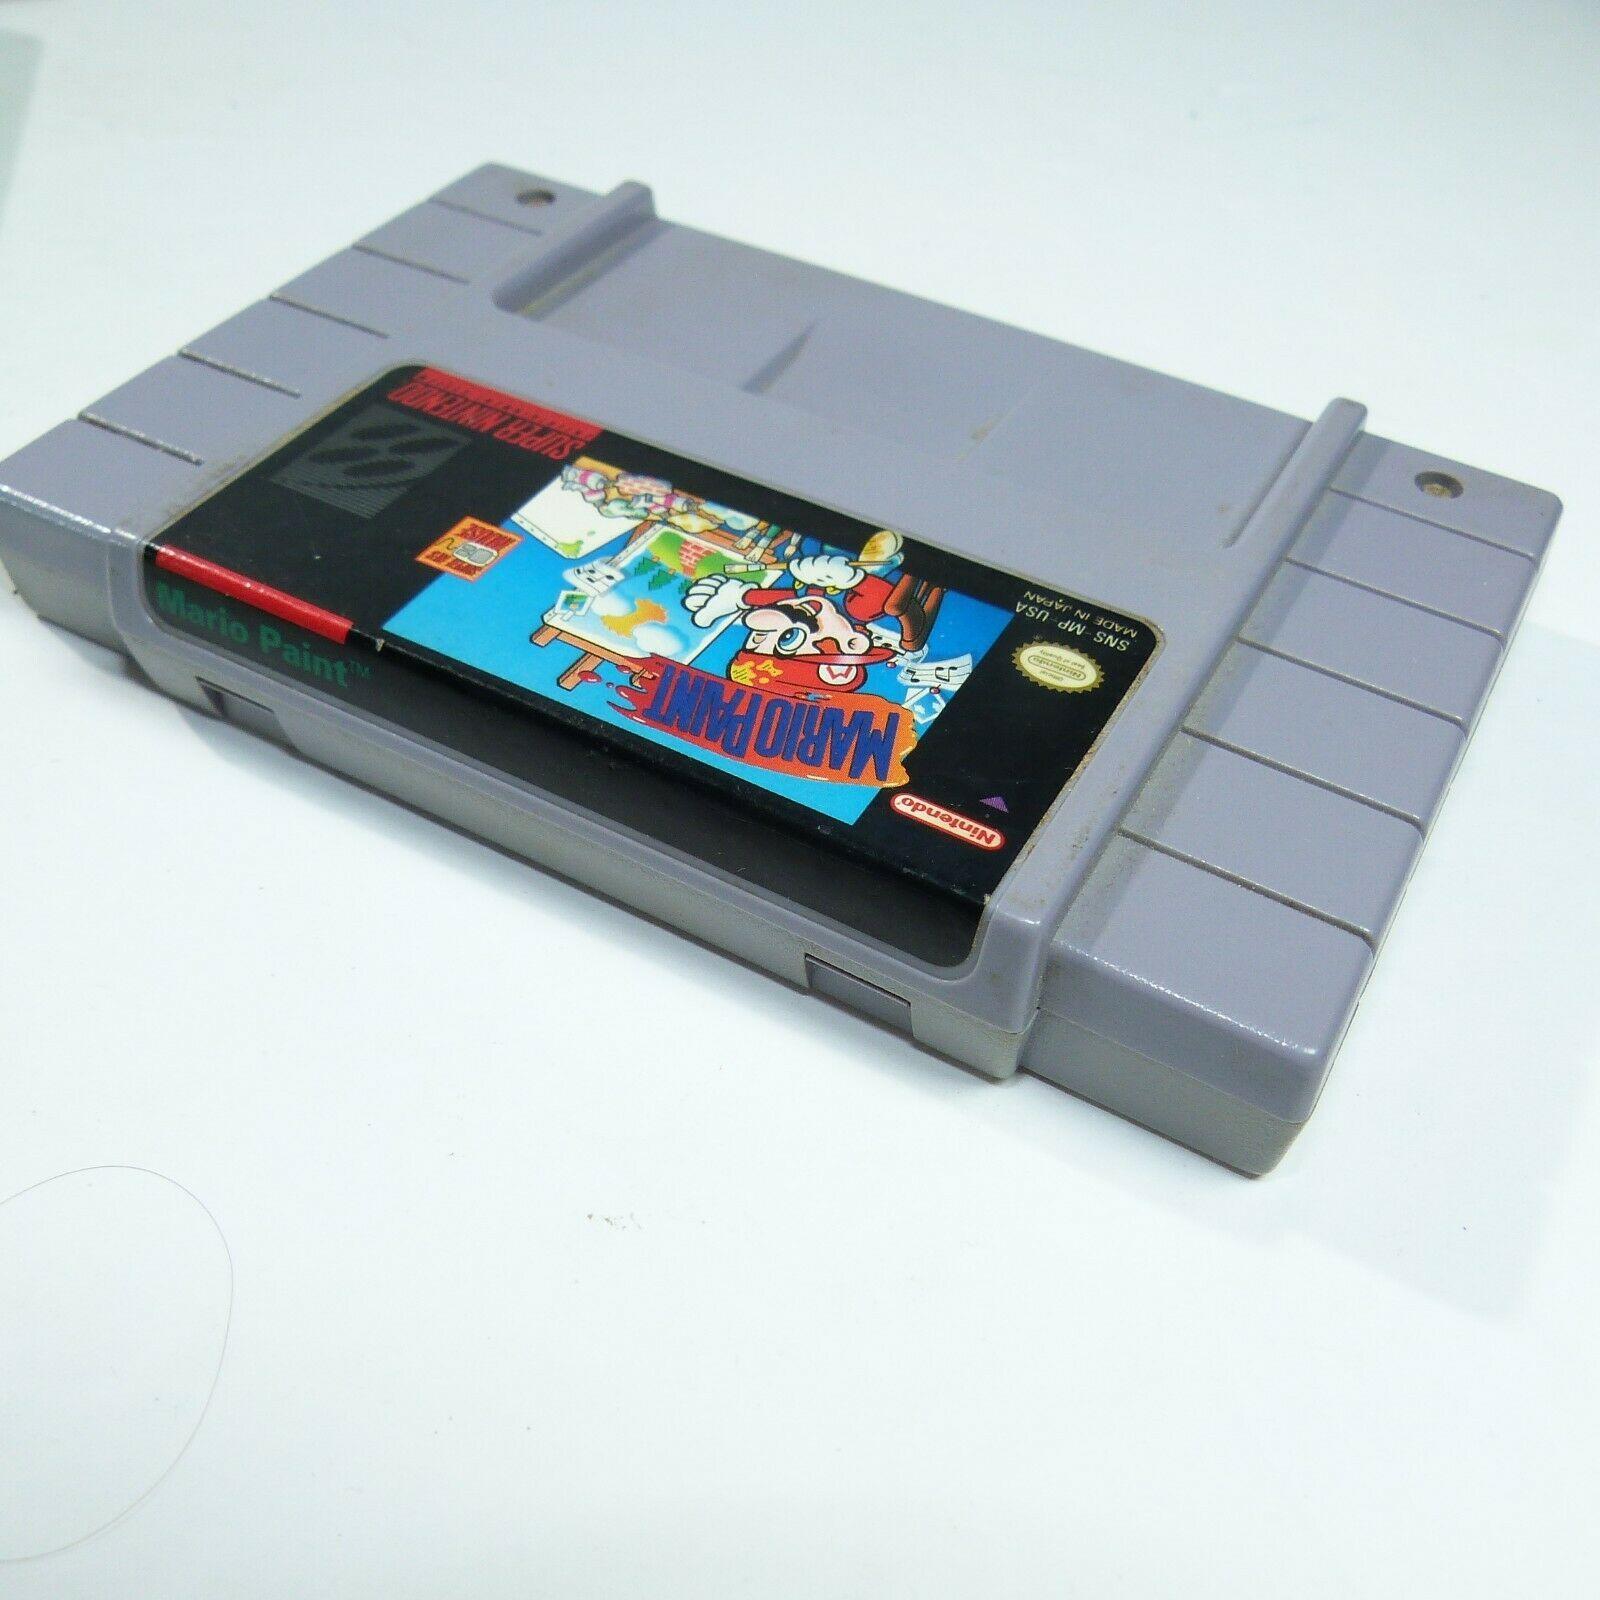 Mario Paint (Super Nintendo Entertainment System, 1992) image 2